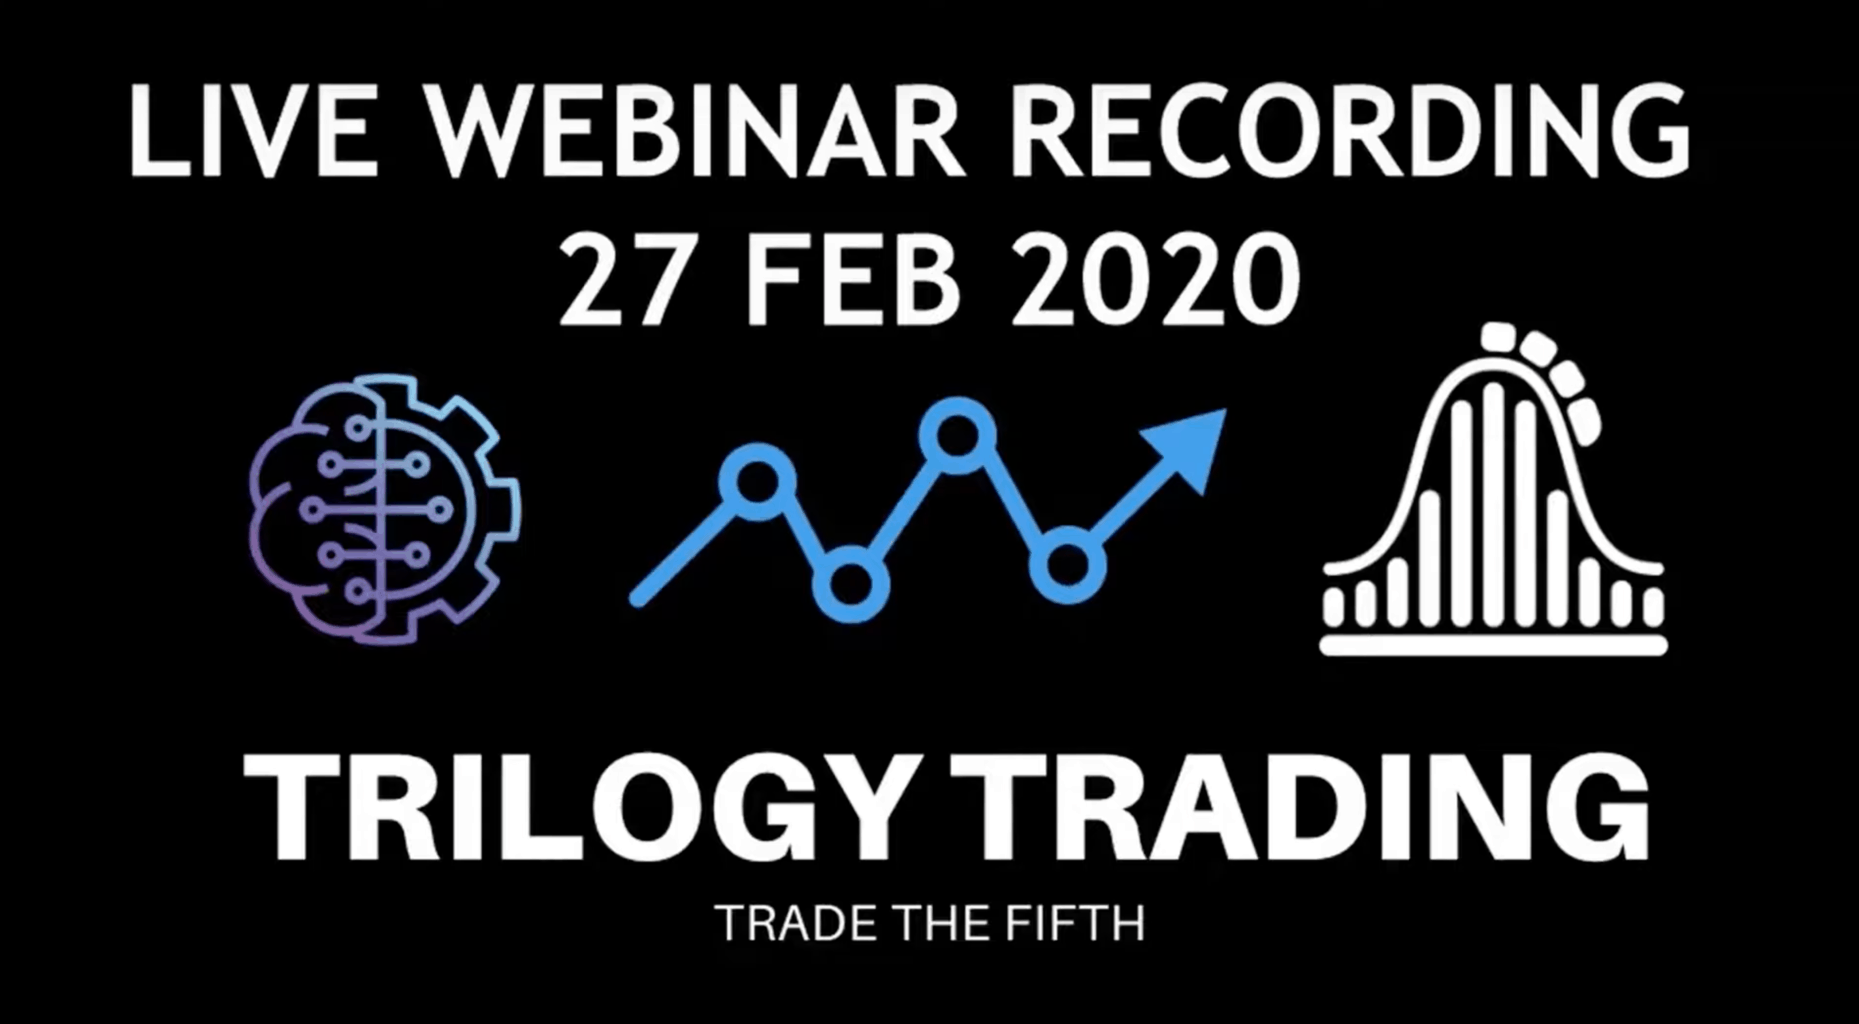 trilogy trading live webinar Feb